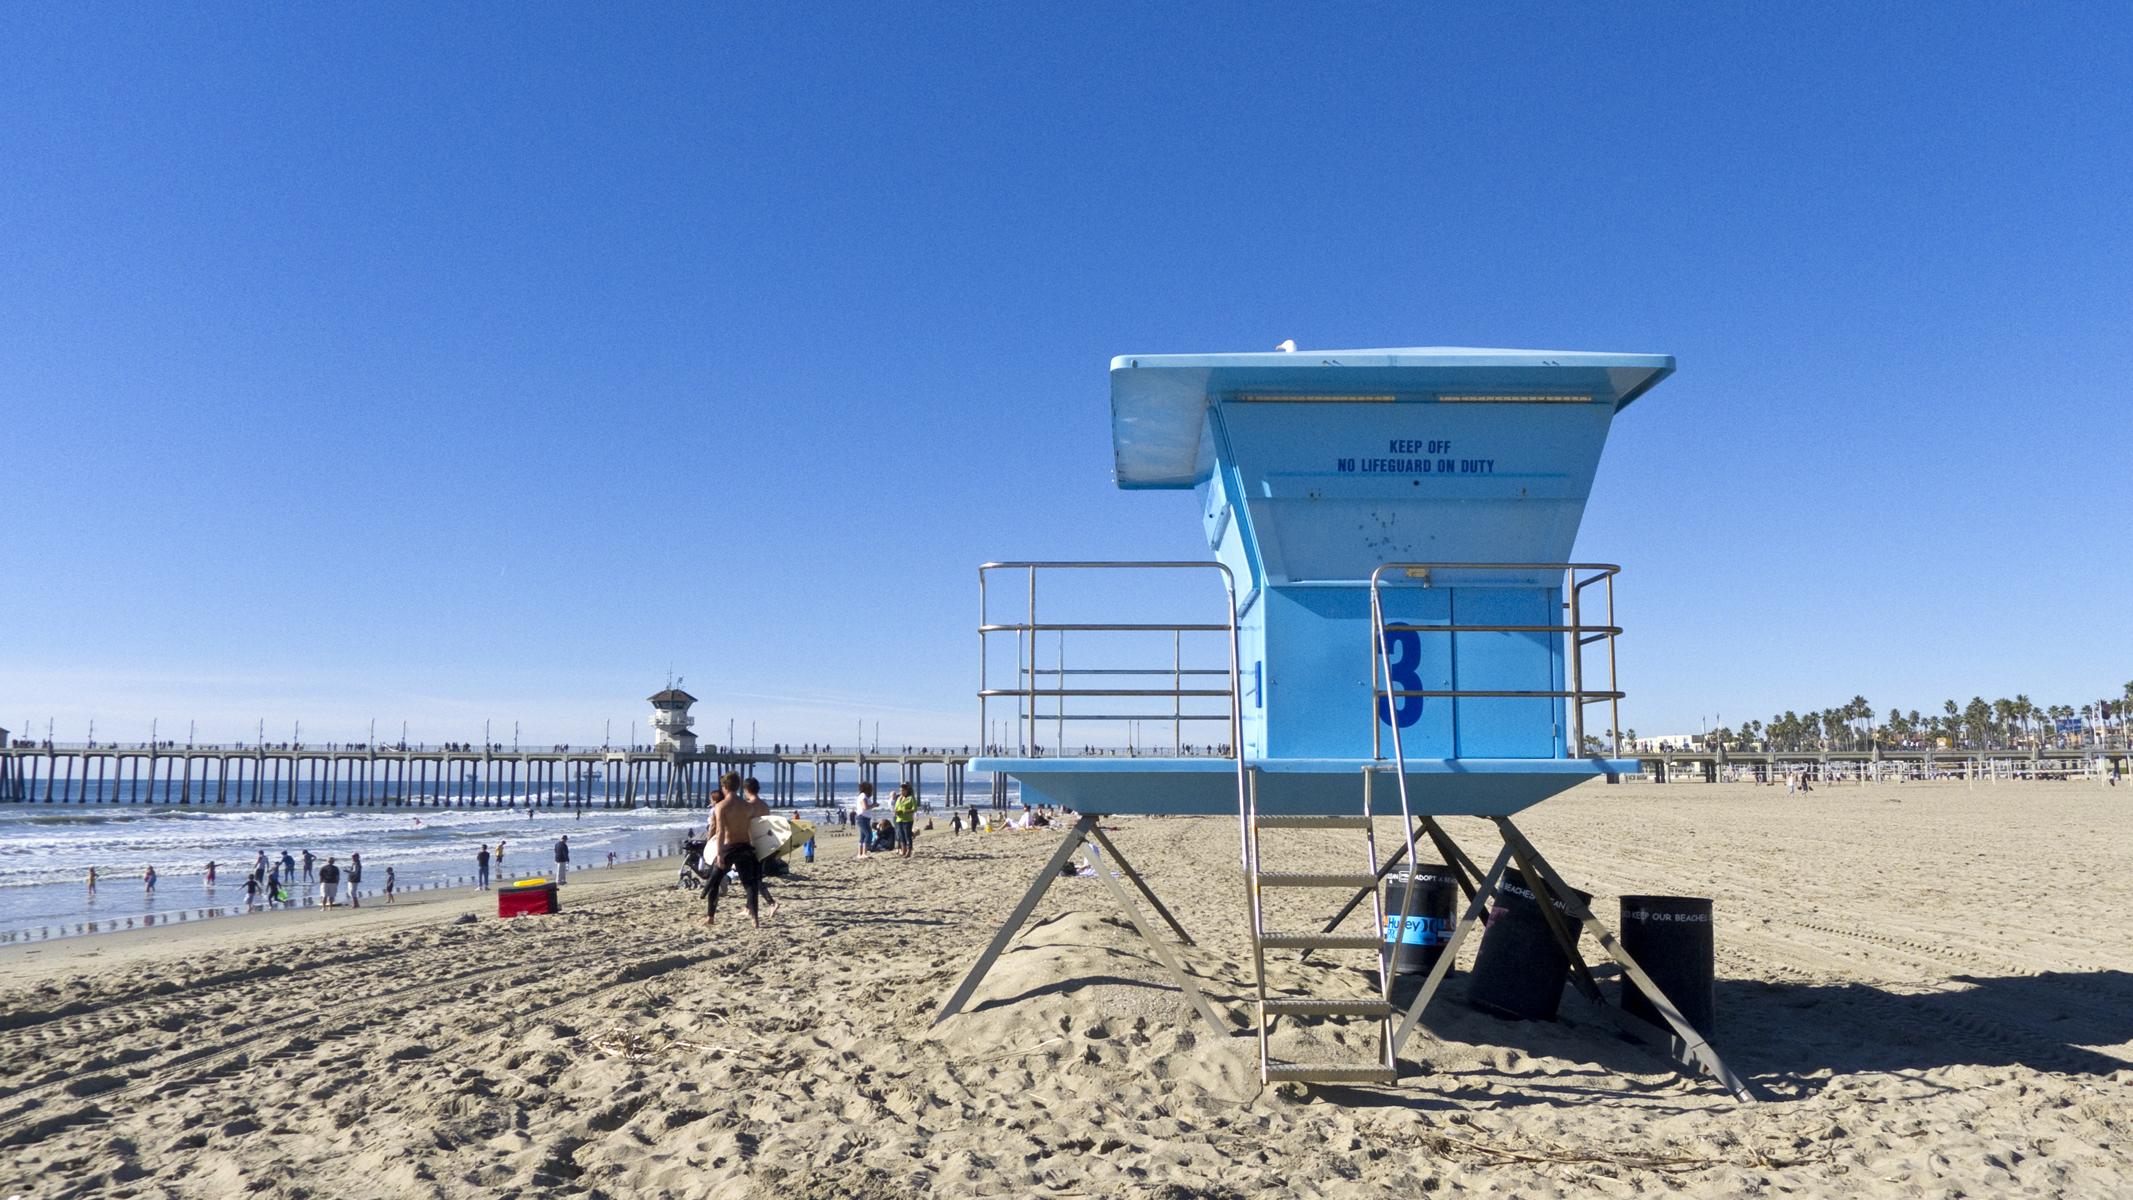 huntington_beach_lifeguradstand.jpg